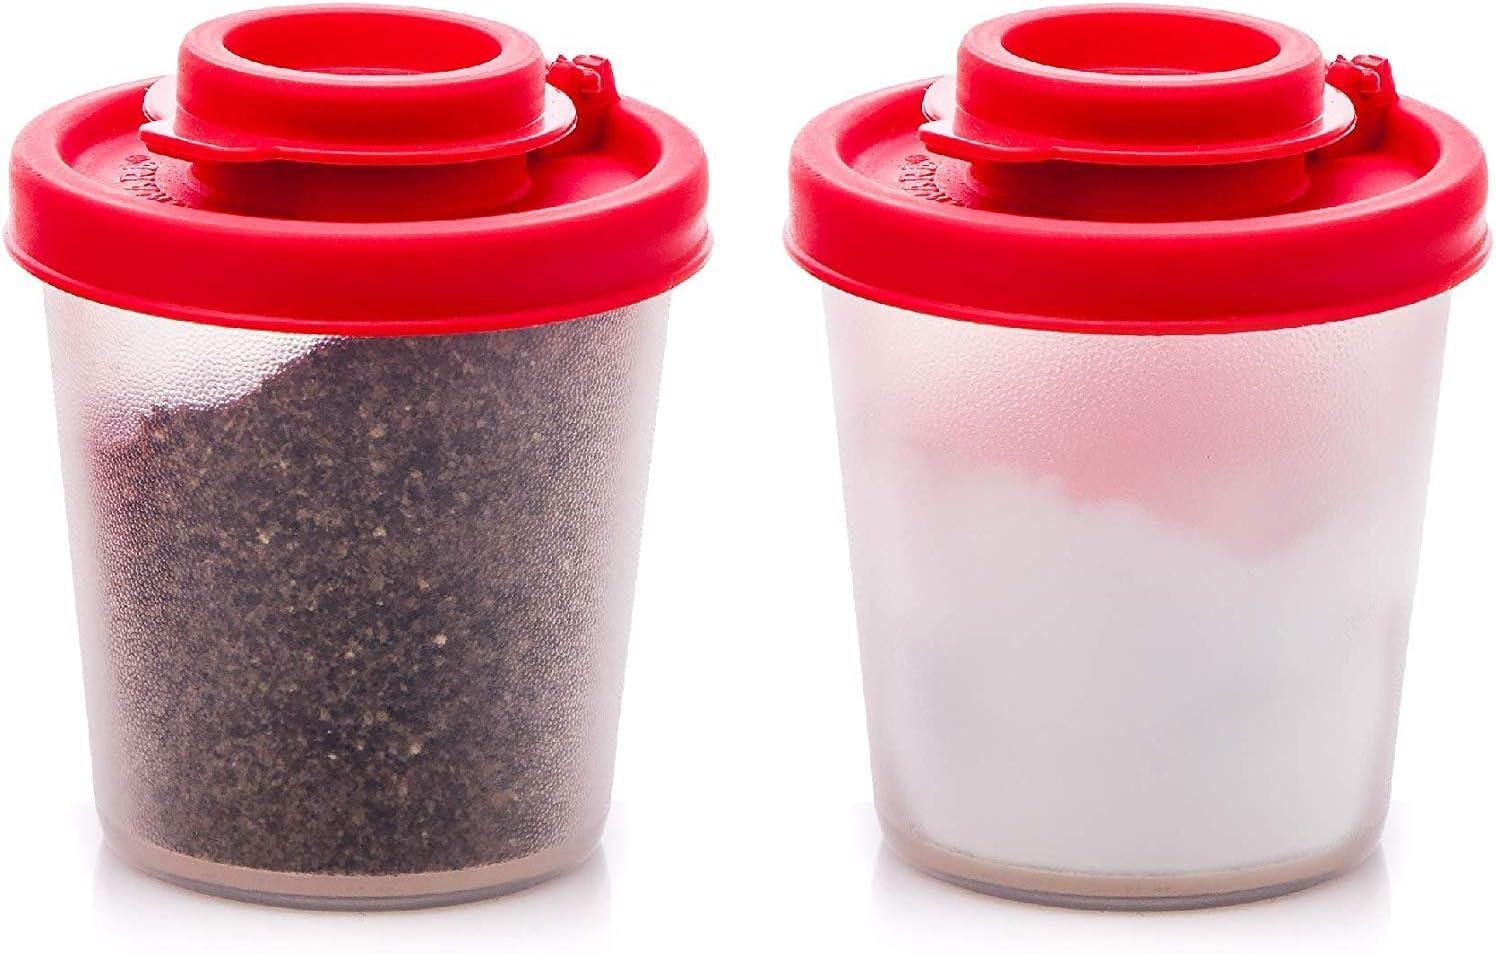 Moisture Proof Salt Pepper Shakers Pots Flip Top Glass Table Condiment Bottles